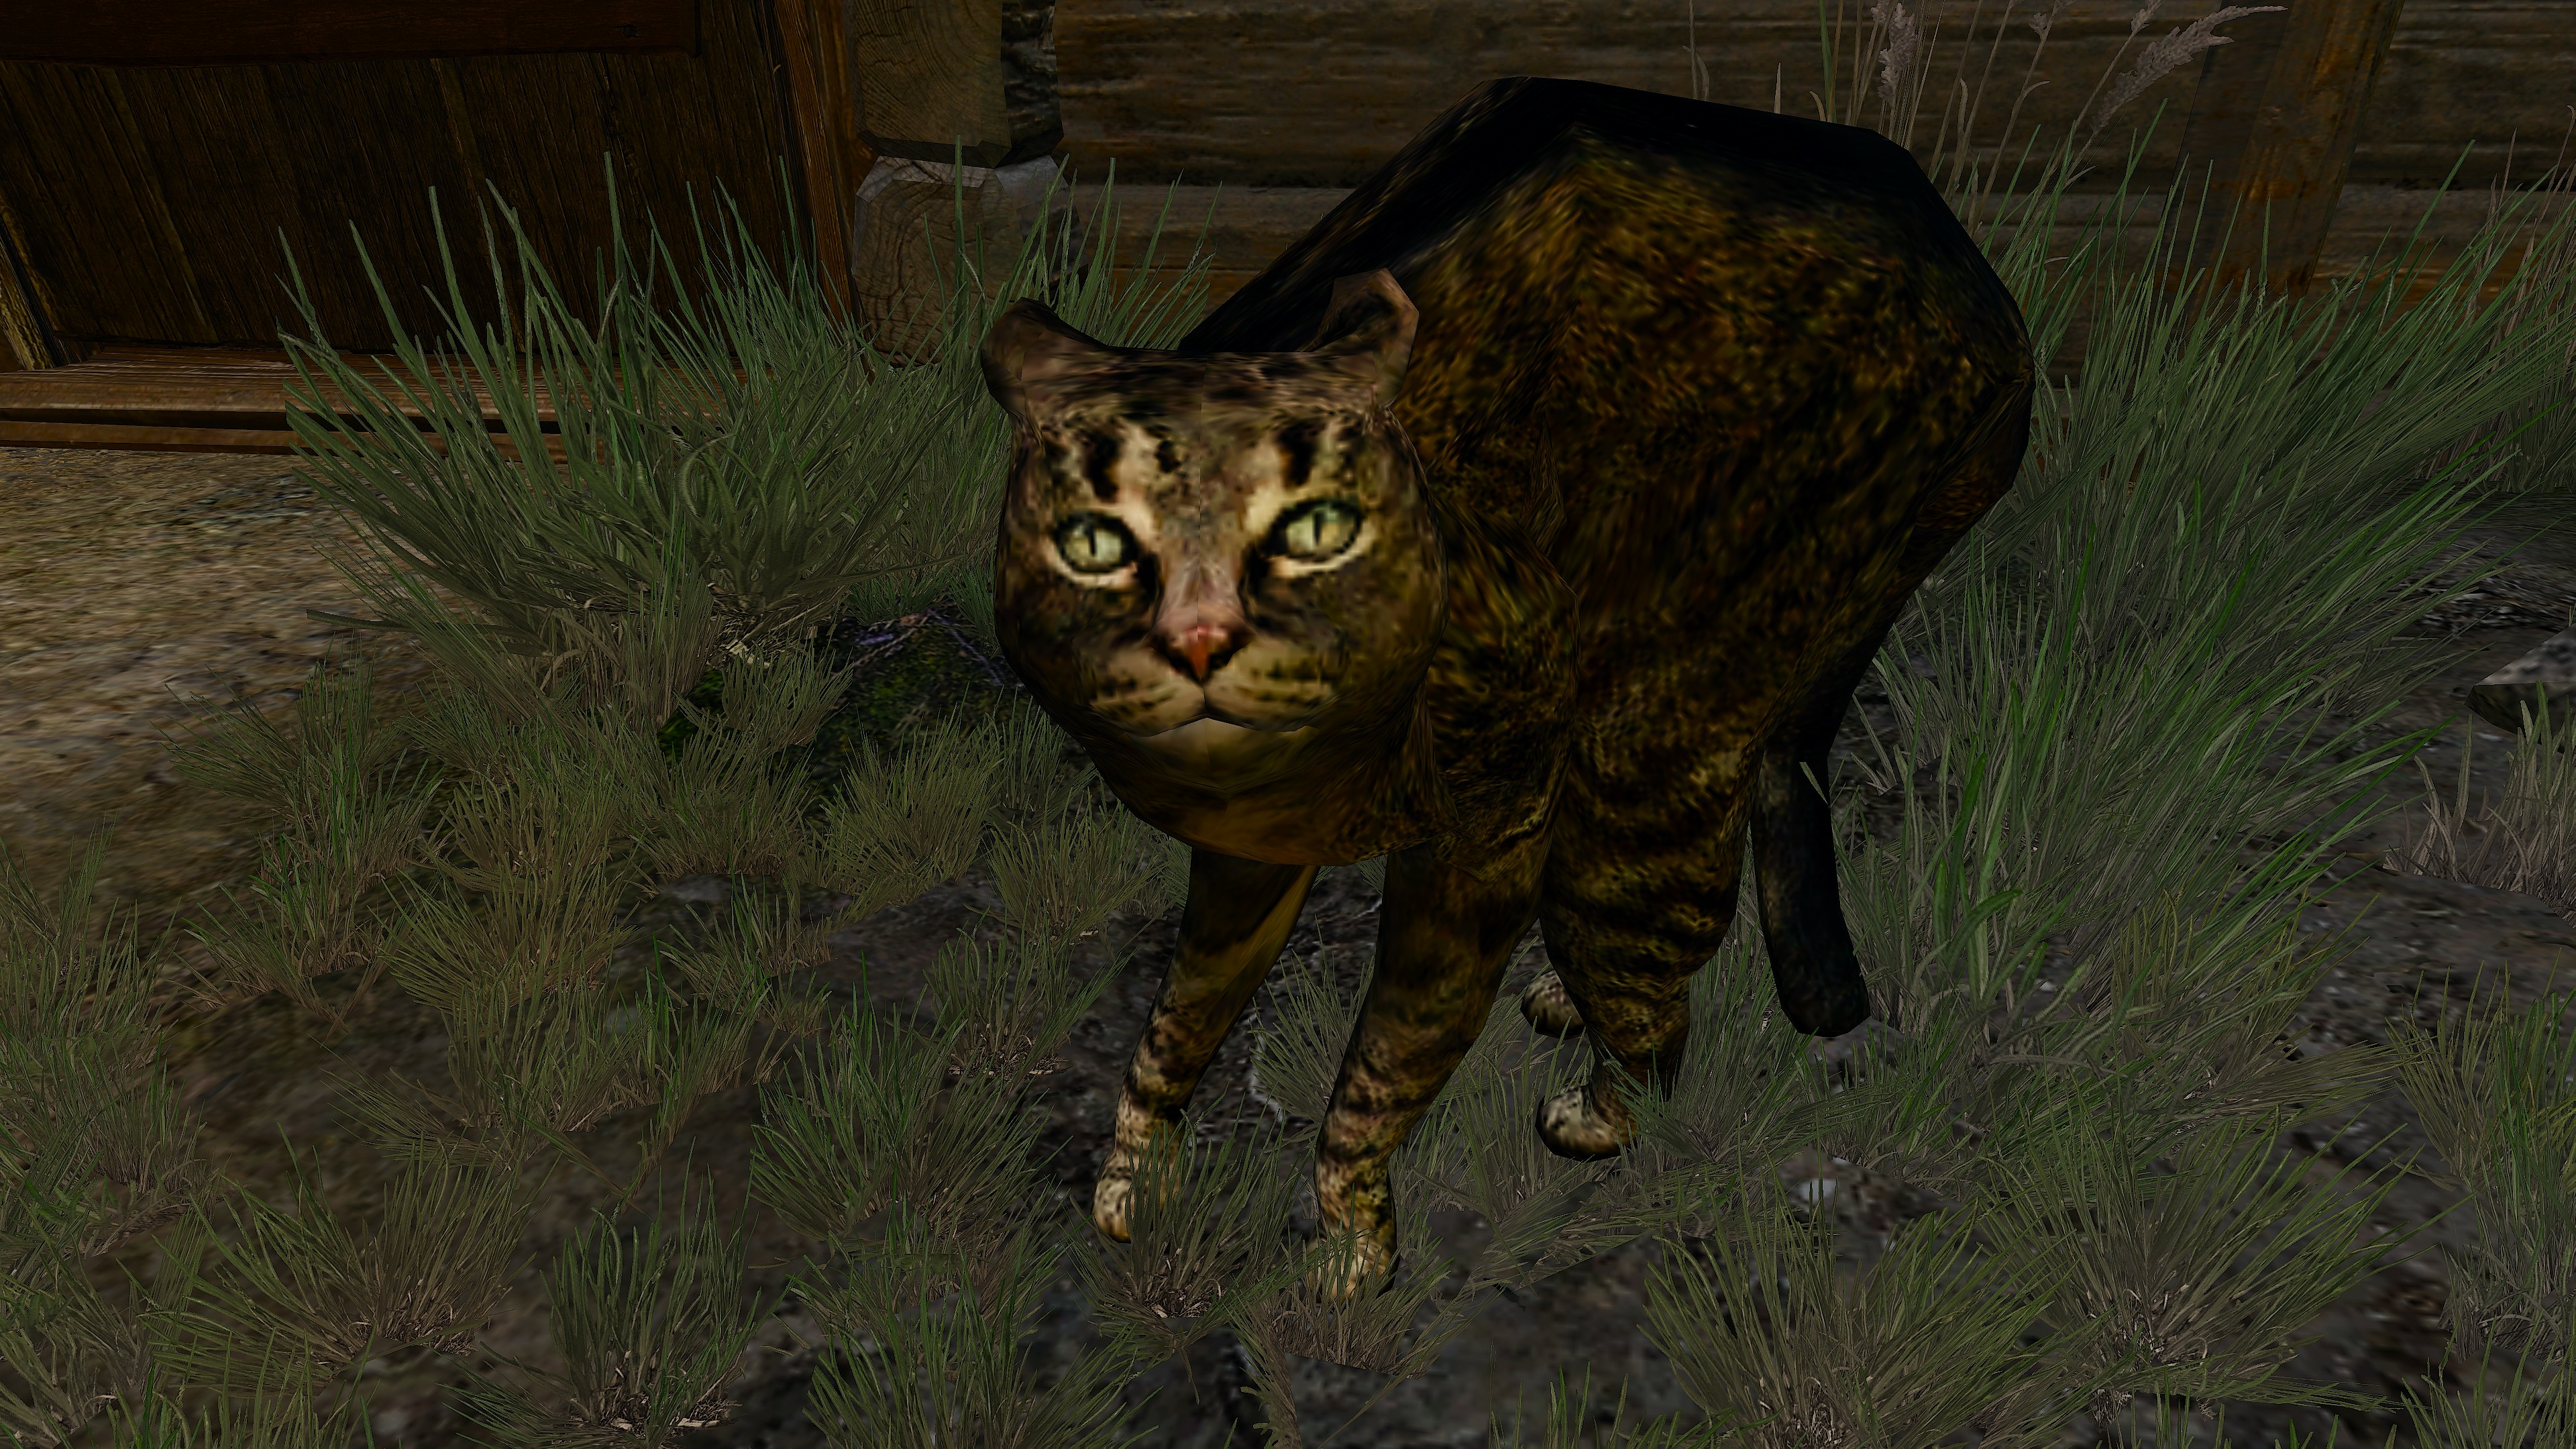 The Witcher 3 Screenshot 2020.07.20 - 19.59.23.jpg - The Witcher 3: Wild Hunt